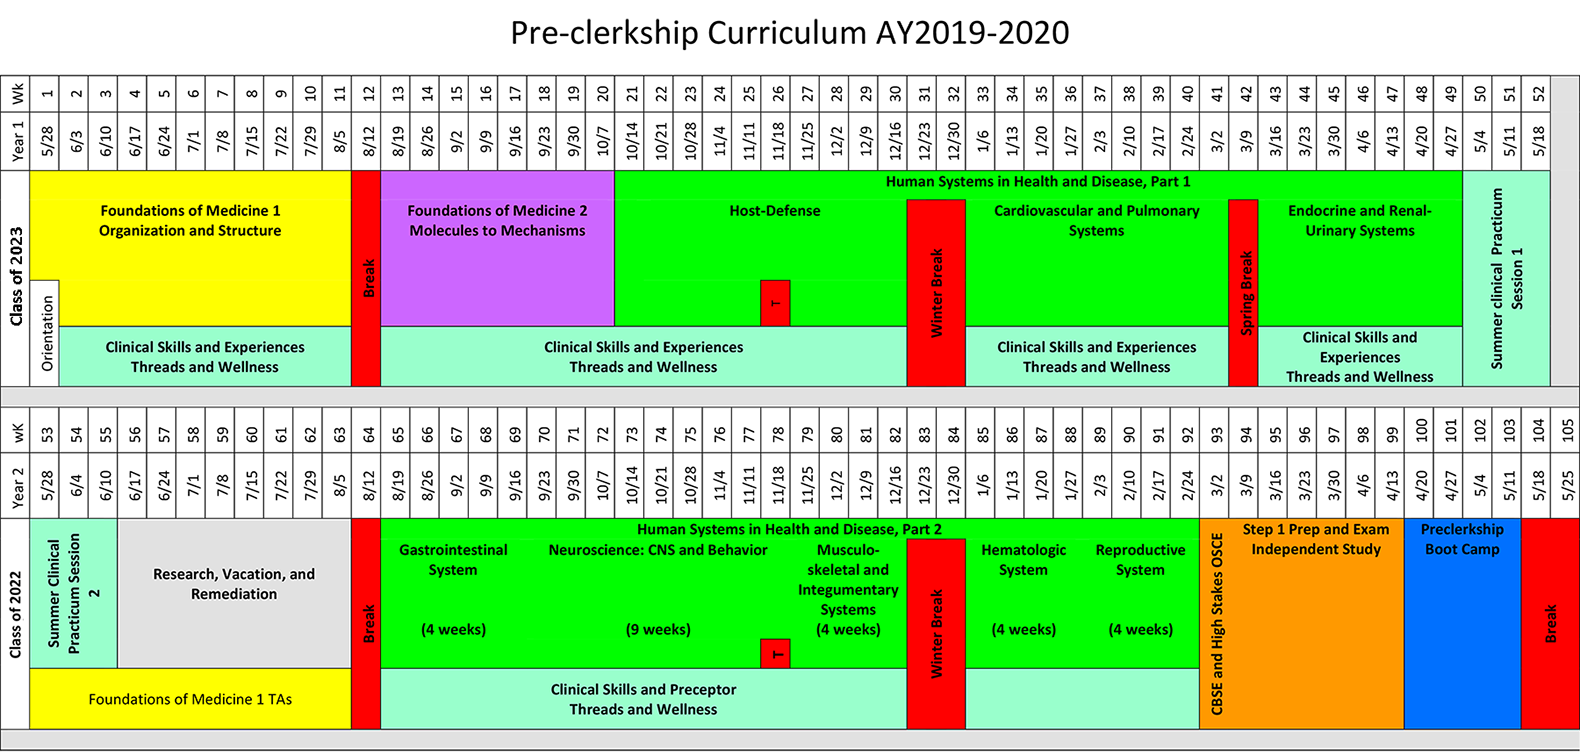 Fsu 2020 Calendar academic calendar next AY | College of Medicine